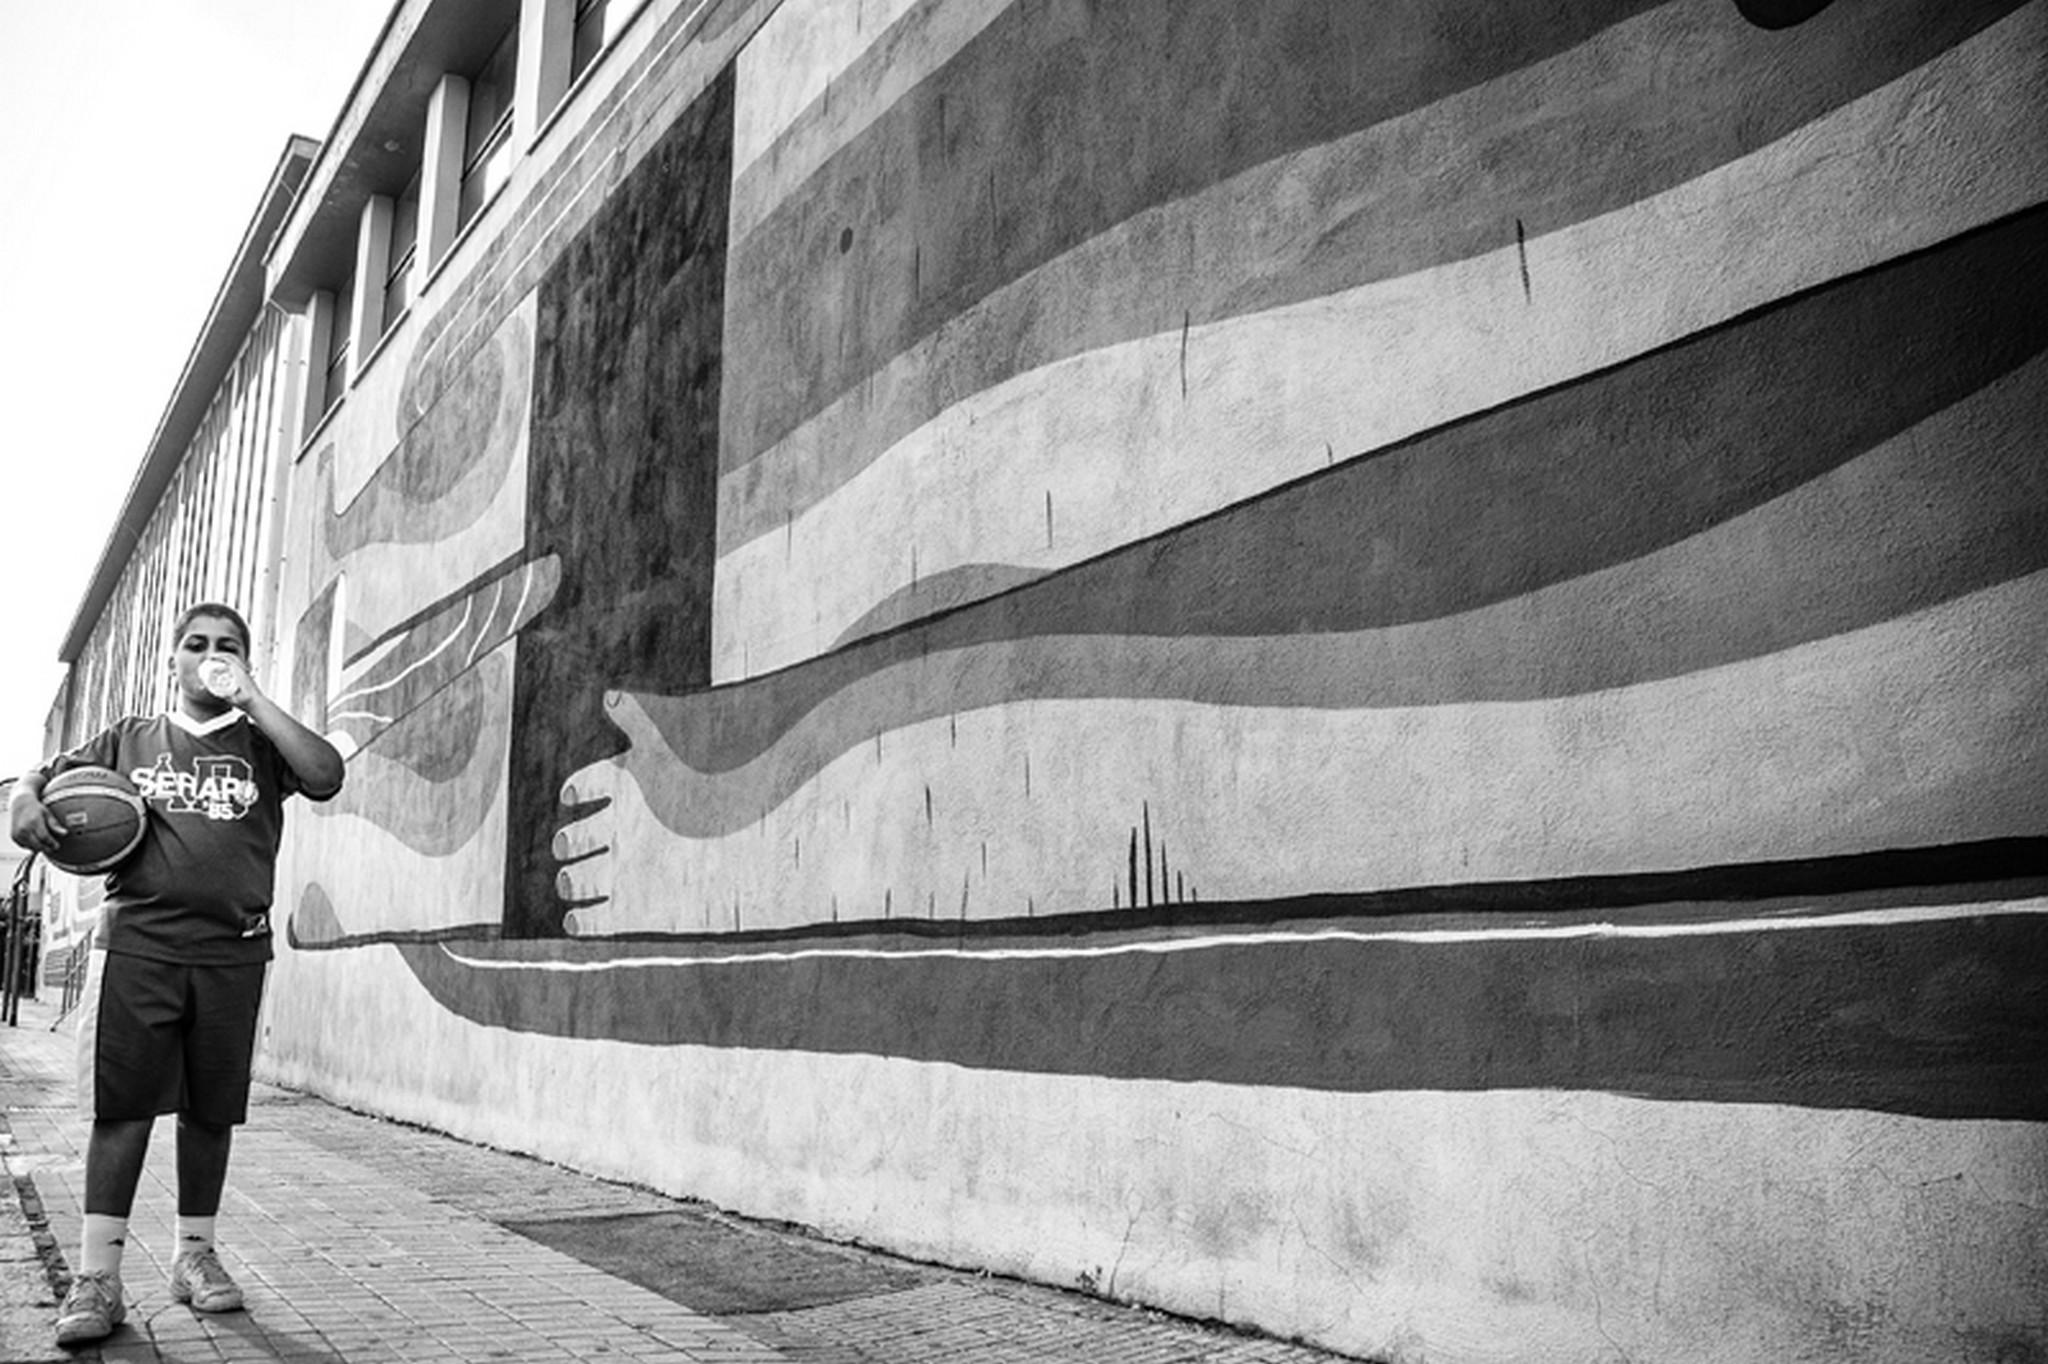 Flavia_Fiengo_memorie urbane00055